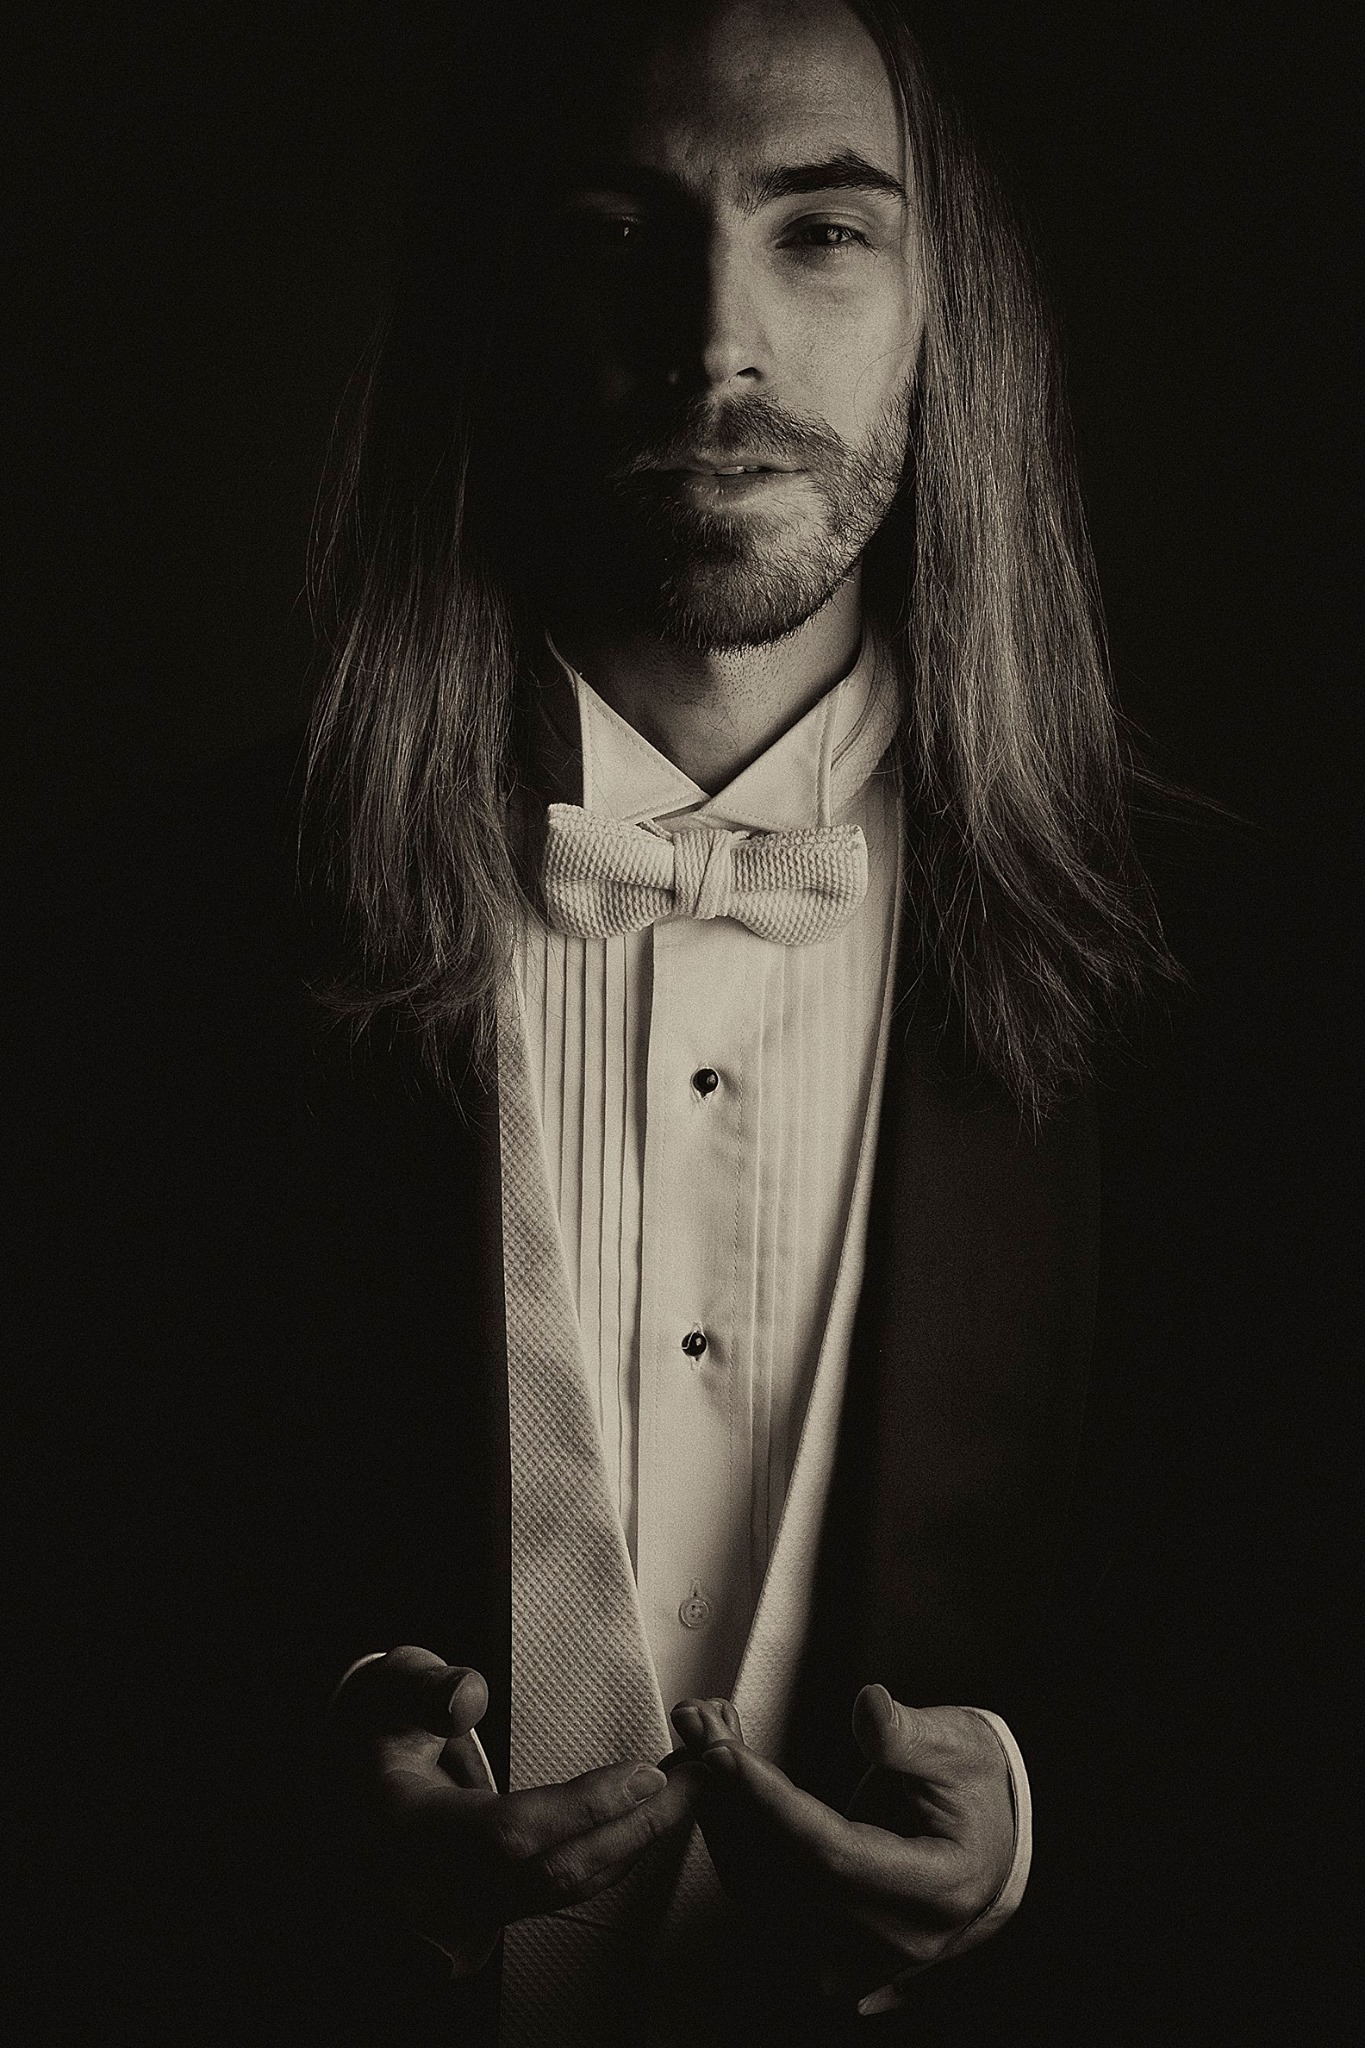 Photo: M. Ritter